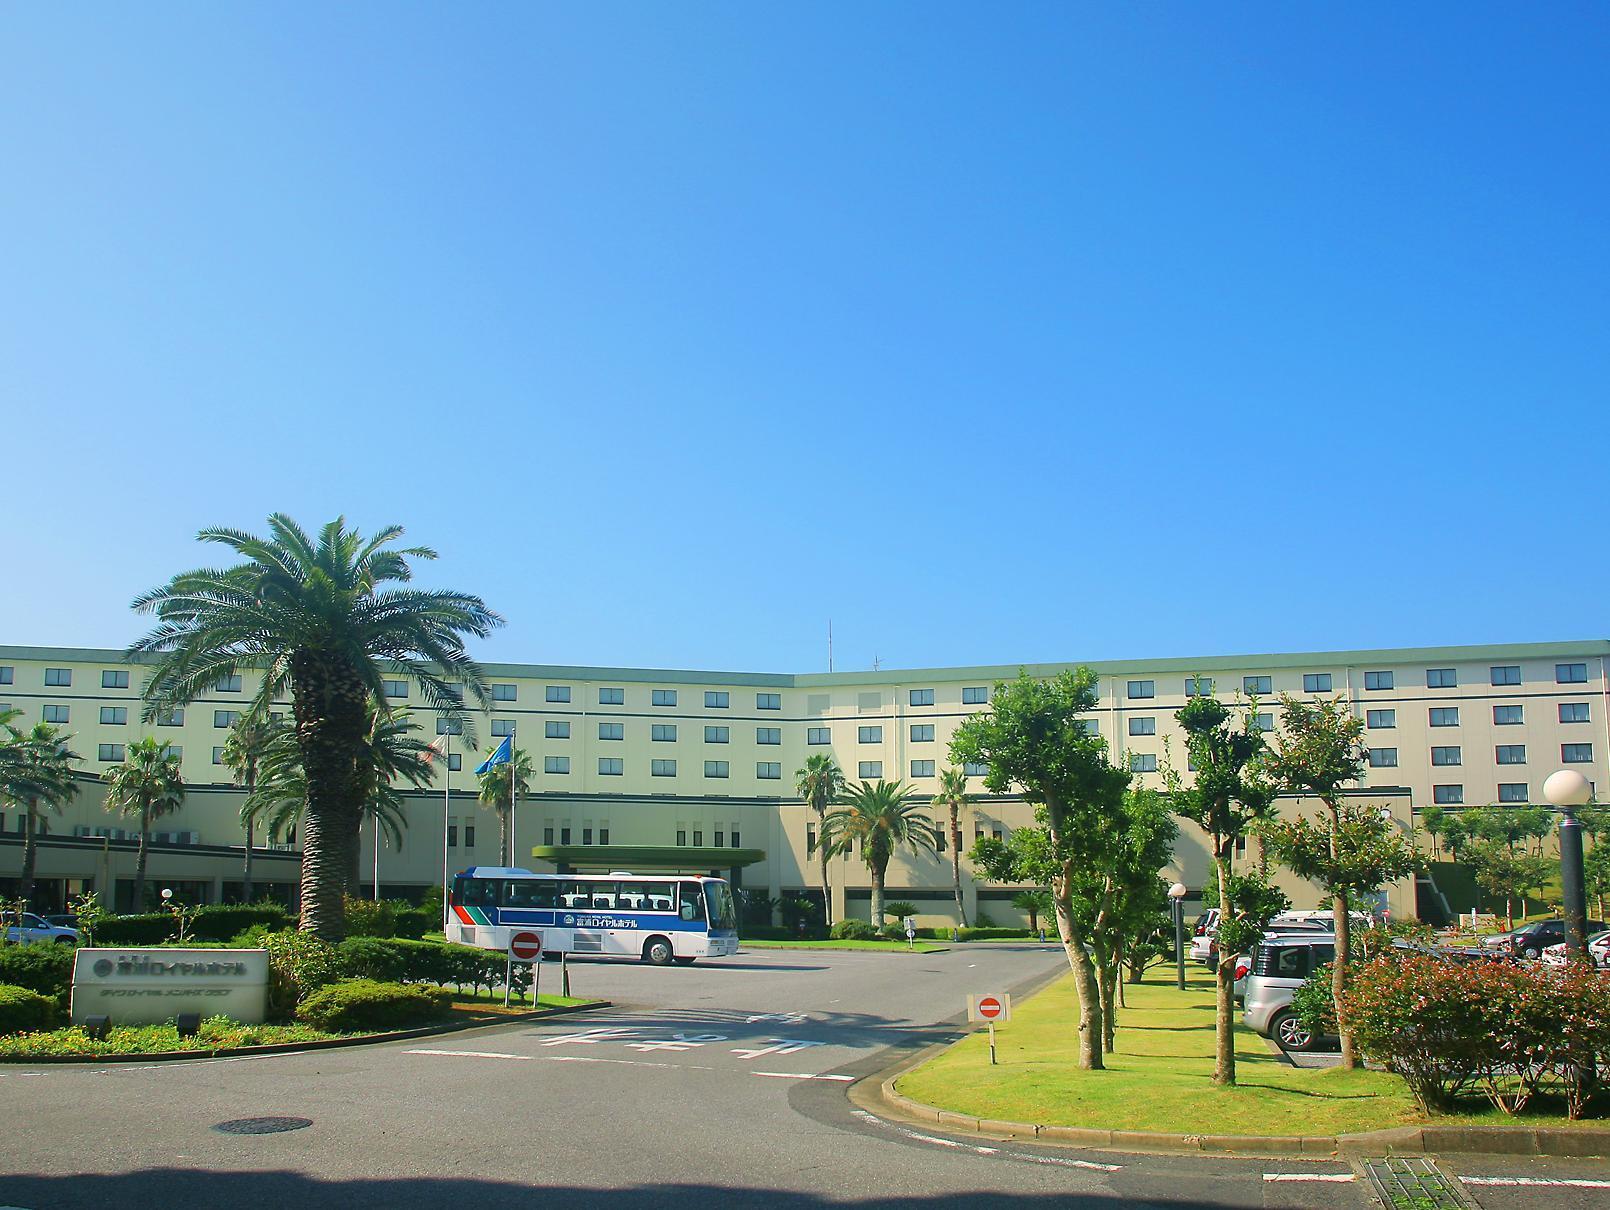 Tomiura Royal Hotel, Minamiboso 南房富浦皇家酒店